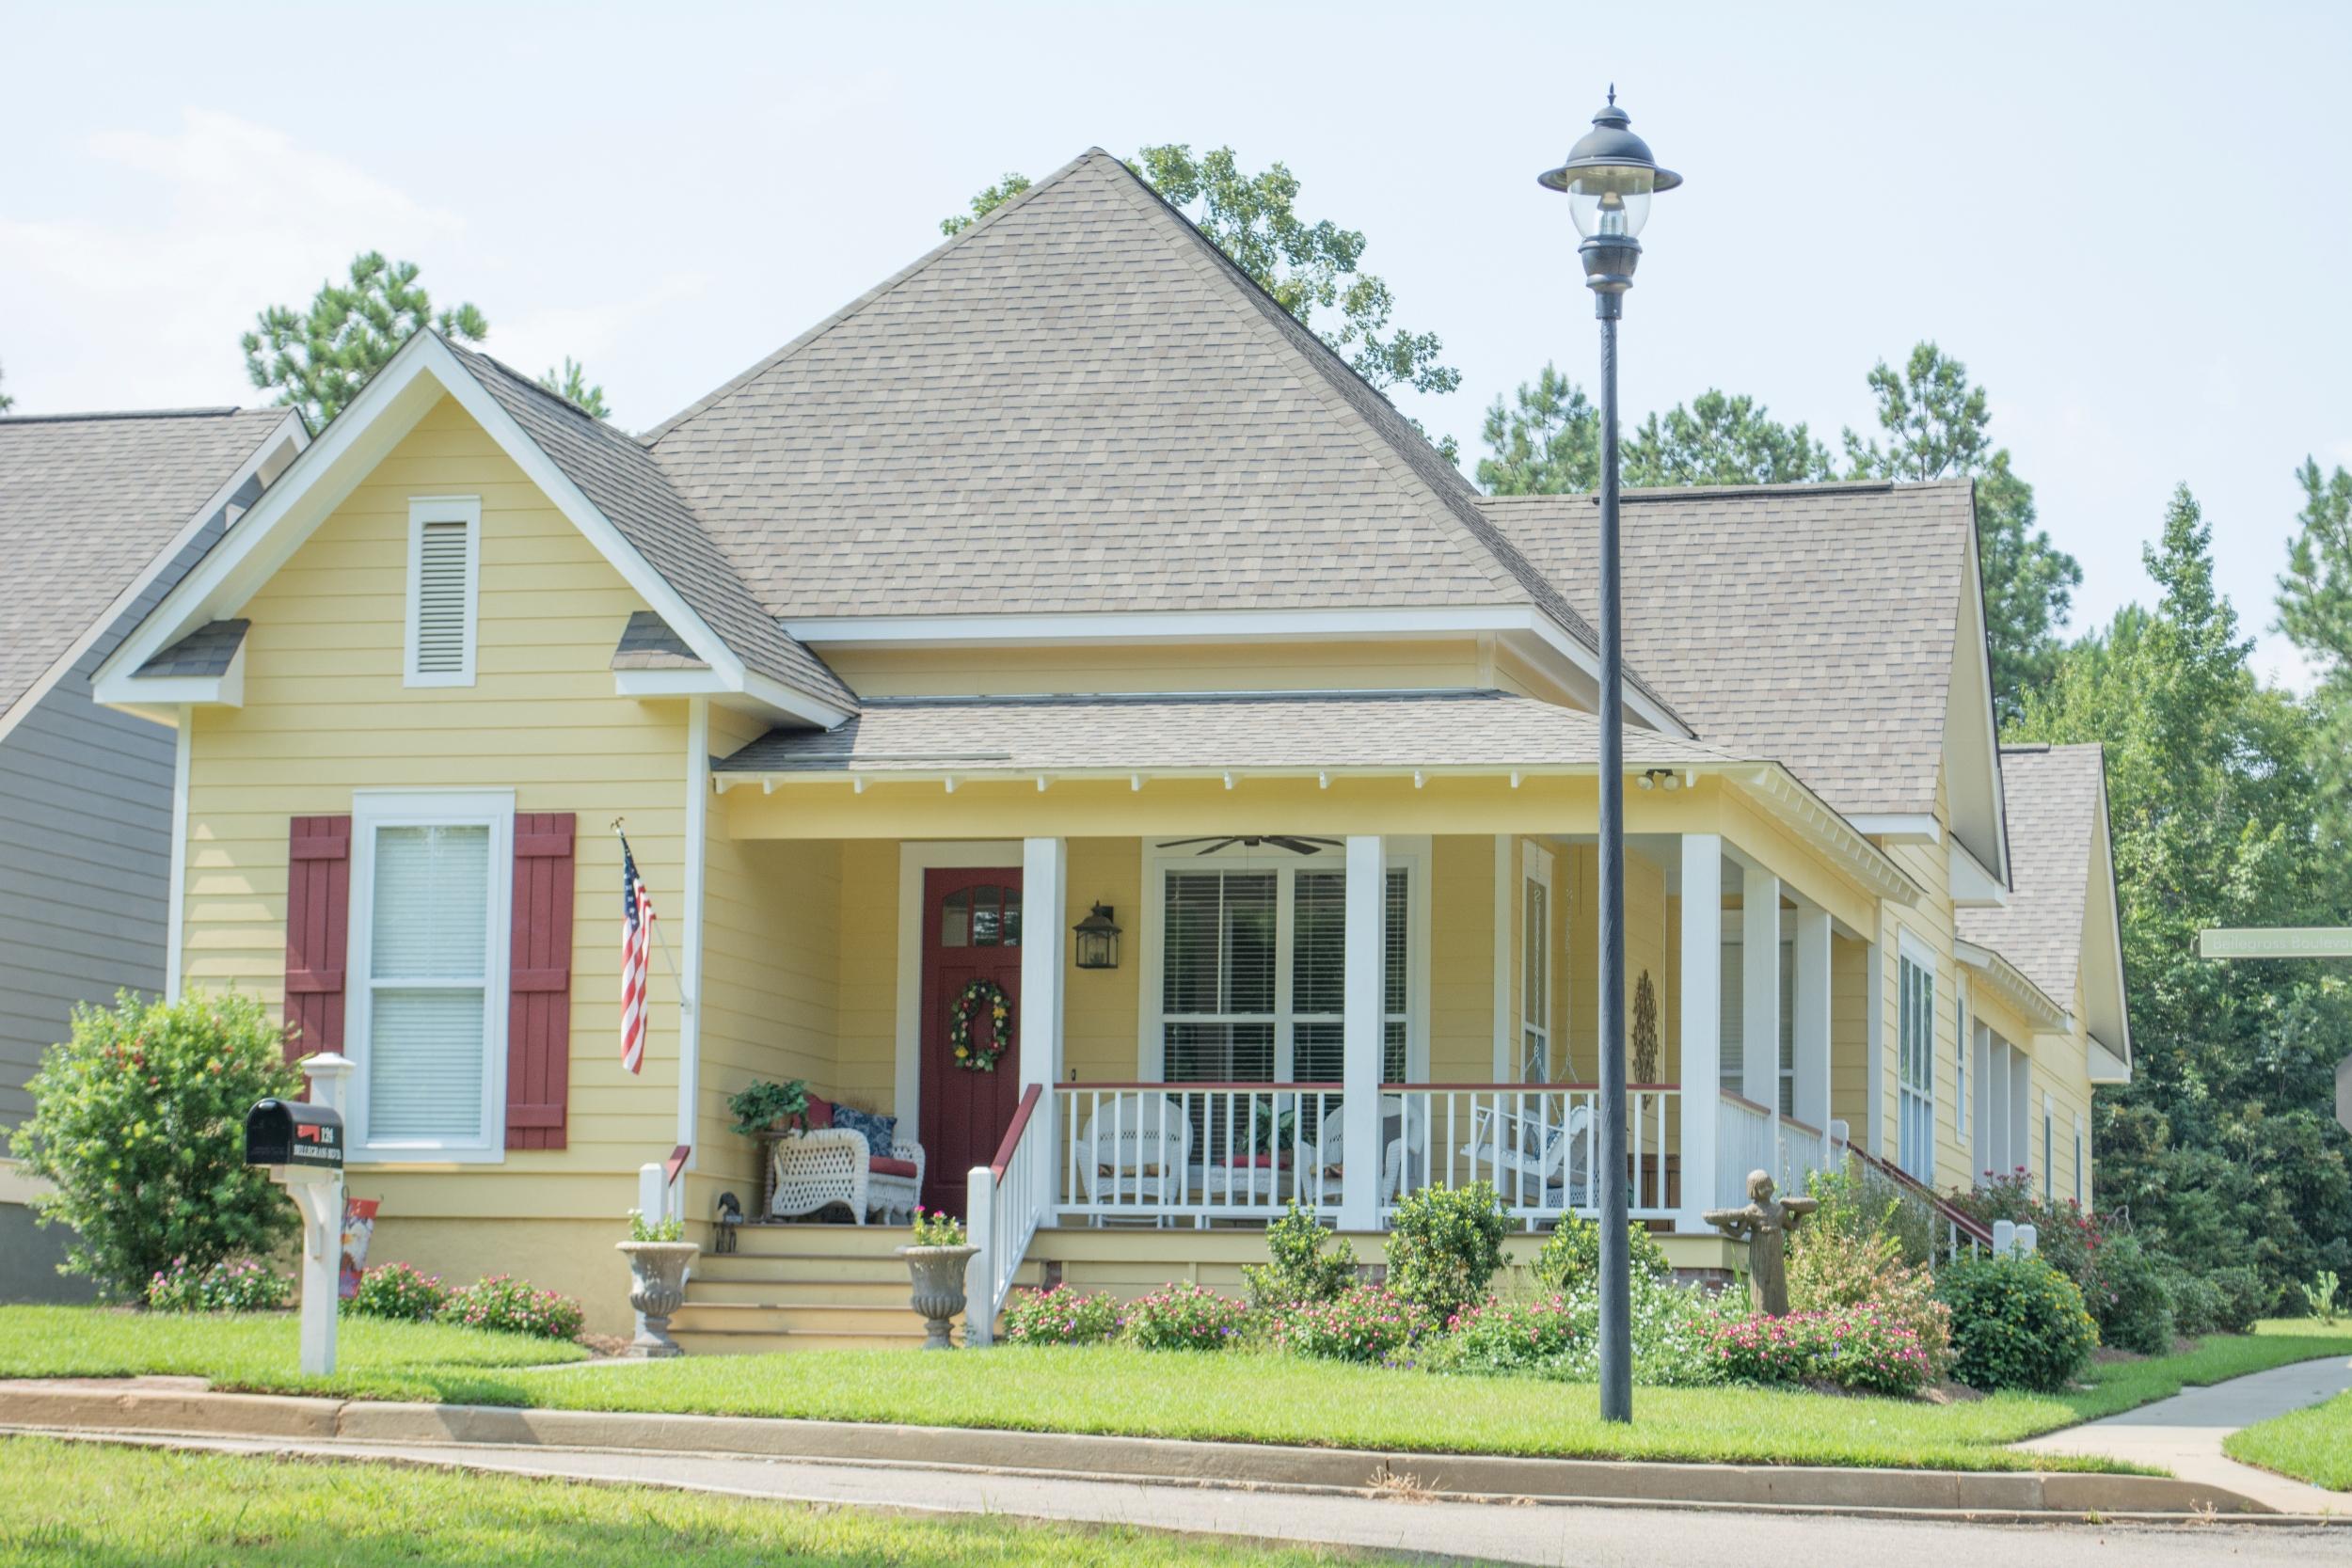 House Plan #142-1080: 3 Bdrm, 1,825 Sq Ft Cottage Home